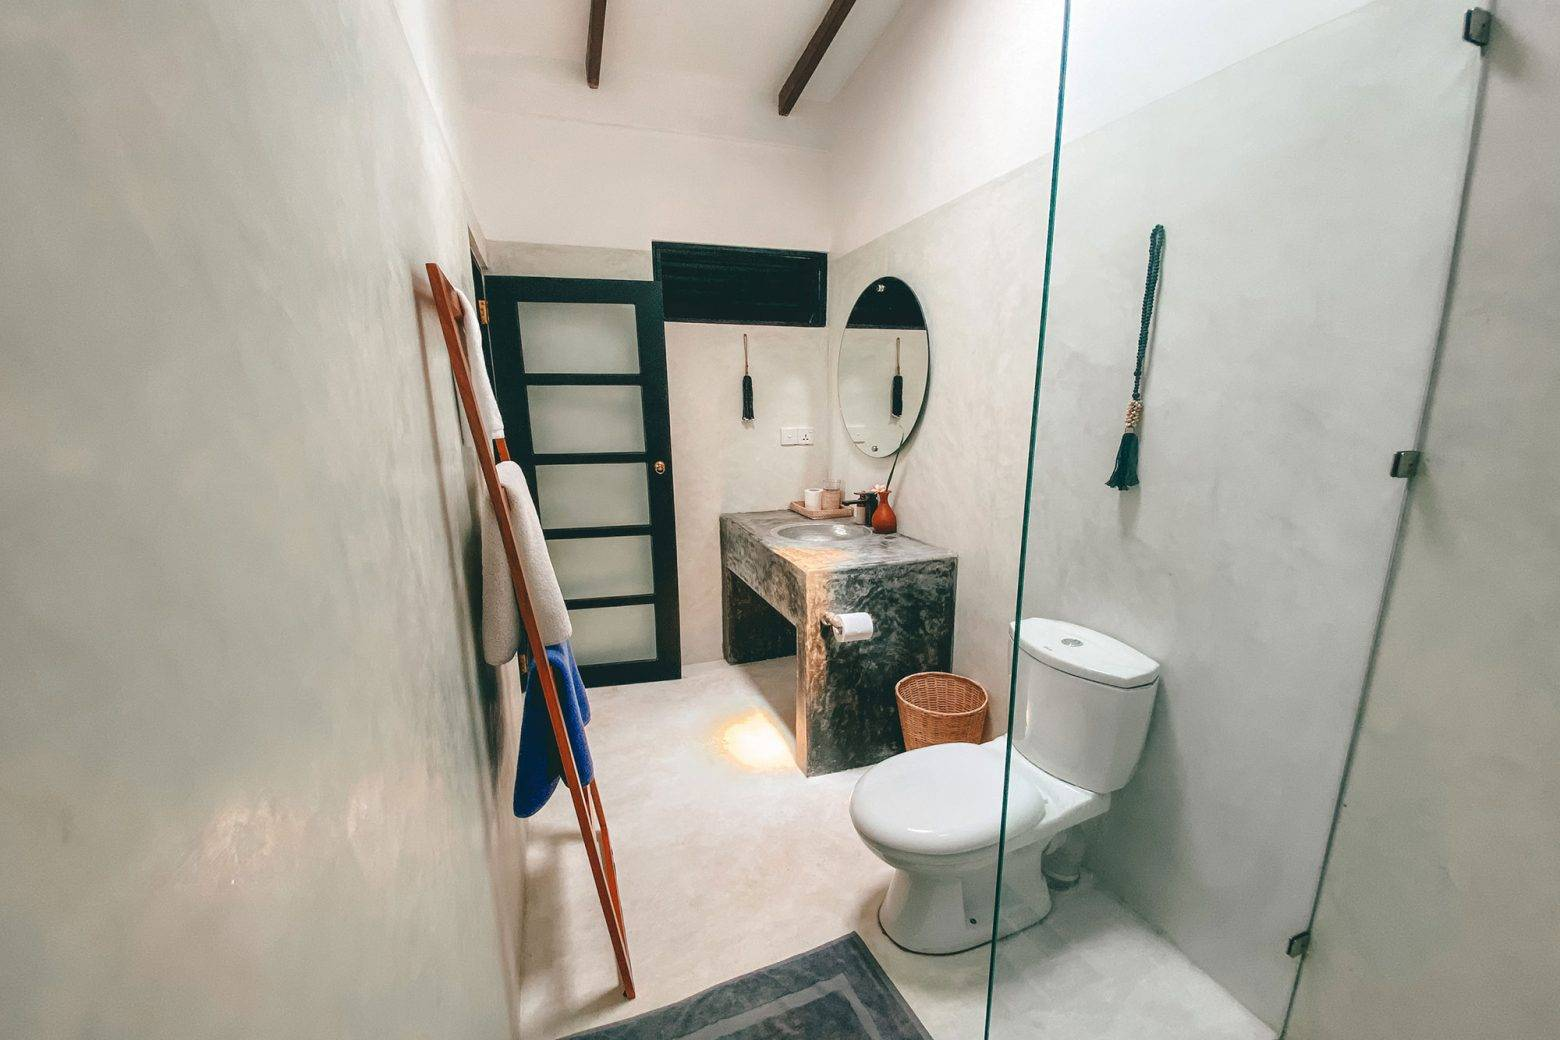 https://www.soulandsurf.com/wp-content/uploads/2021/07/illusion-bnb-bungalowbathroom4-e1627743561174.jpeg